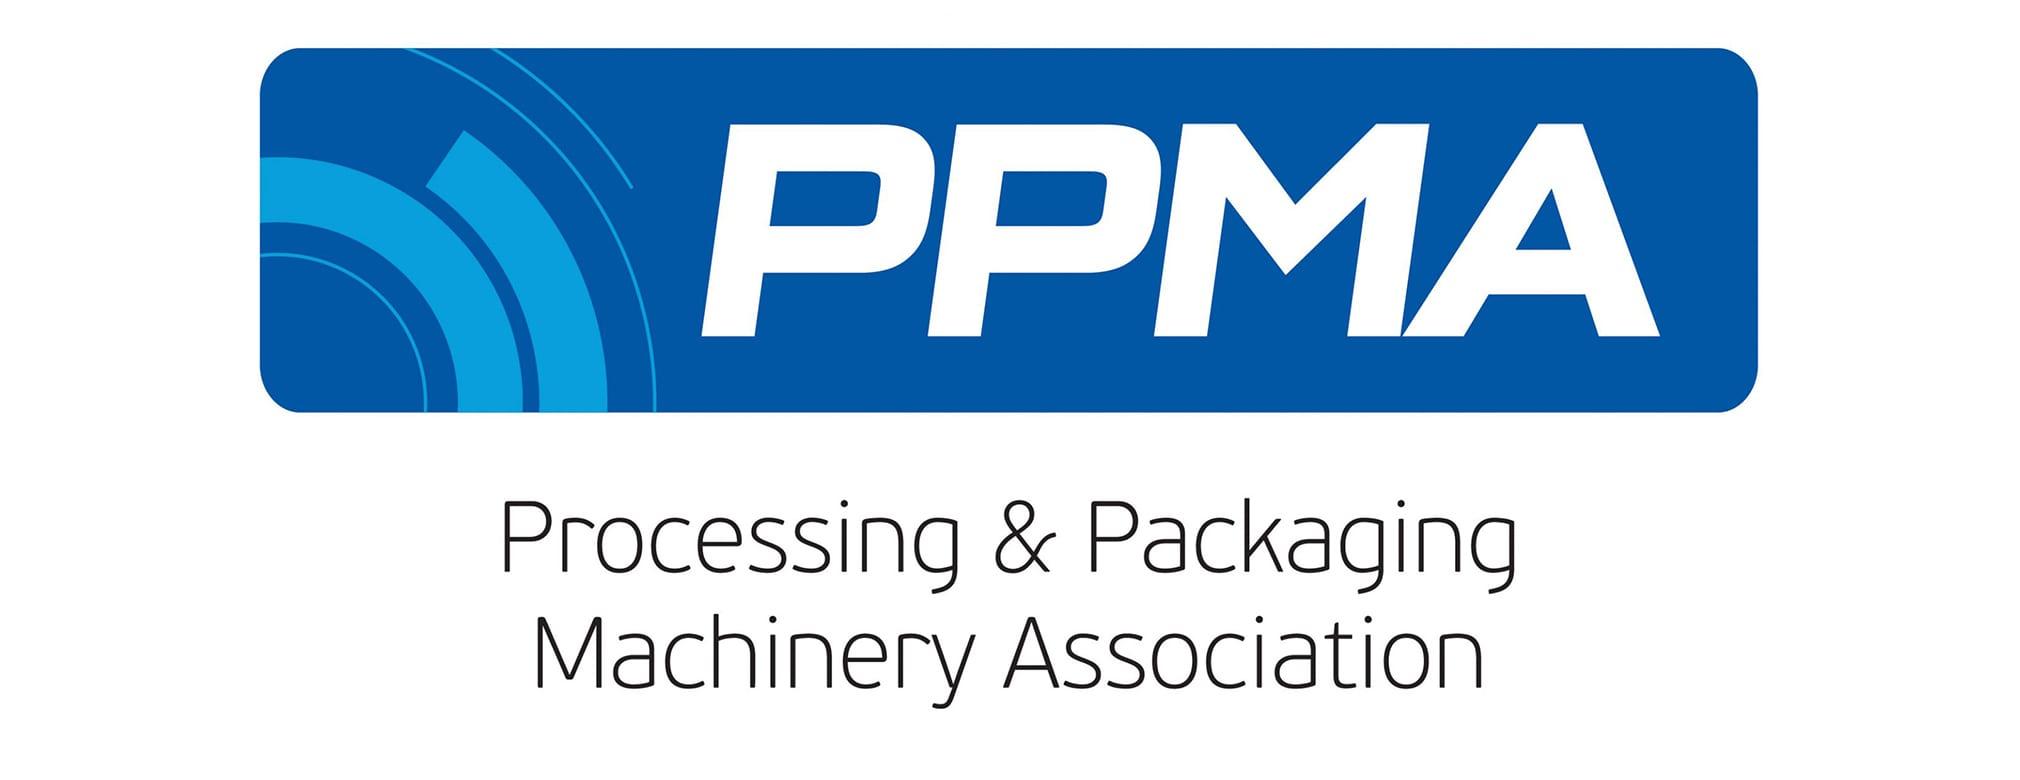 PPMA-logo-2